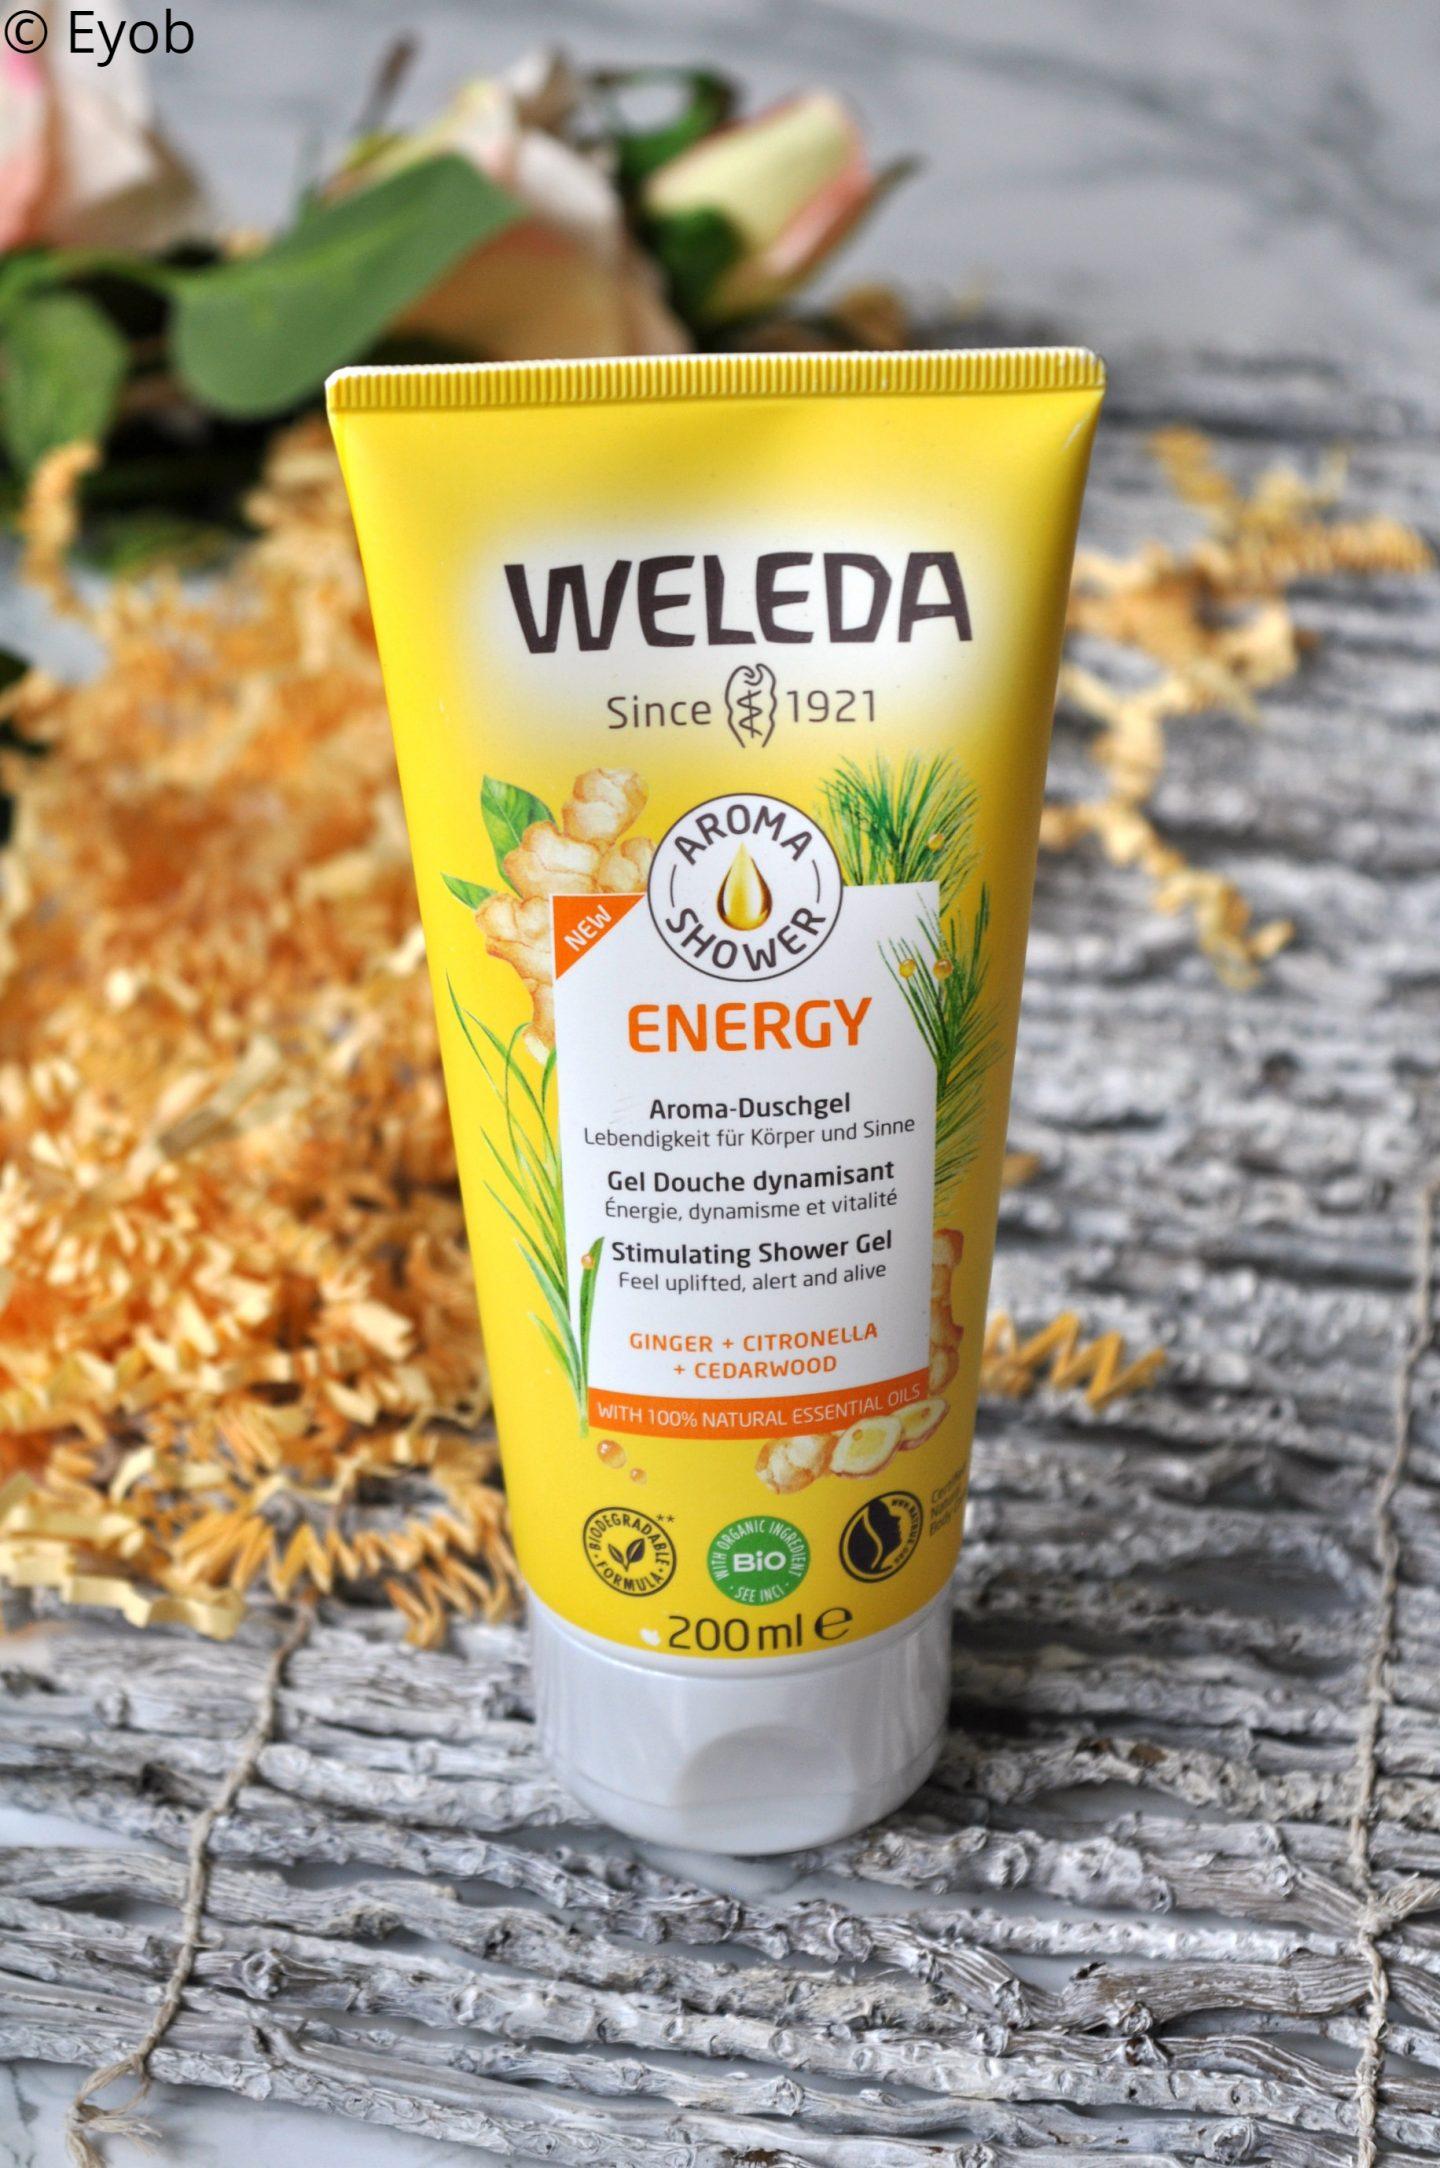 Weleda Energy Aroma Douchegel – Review